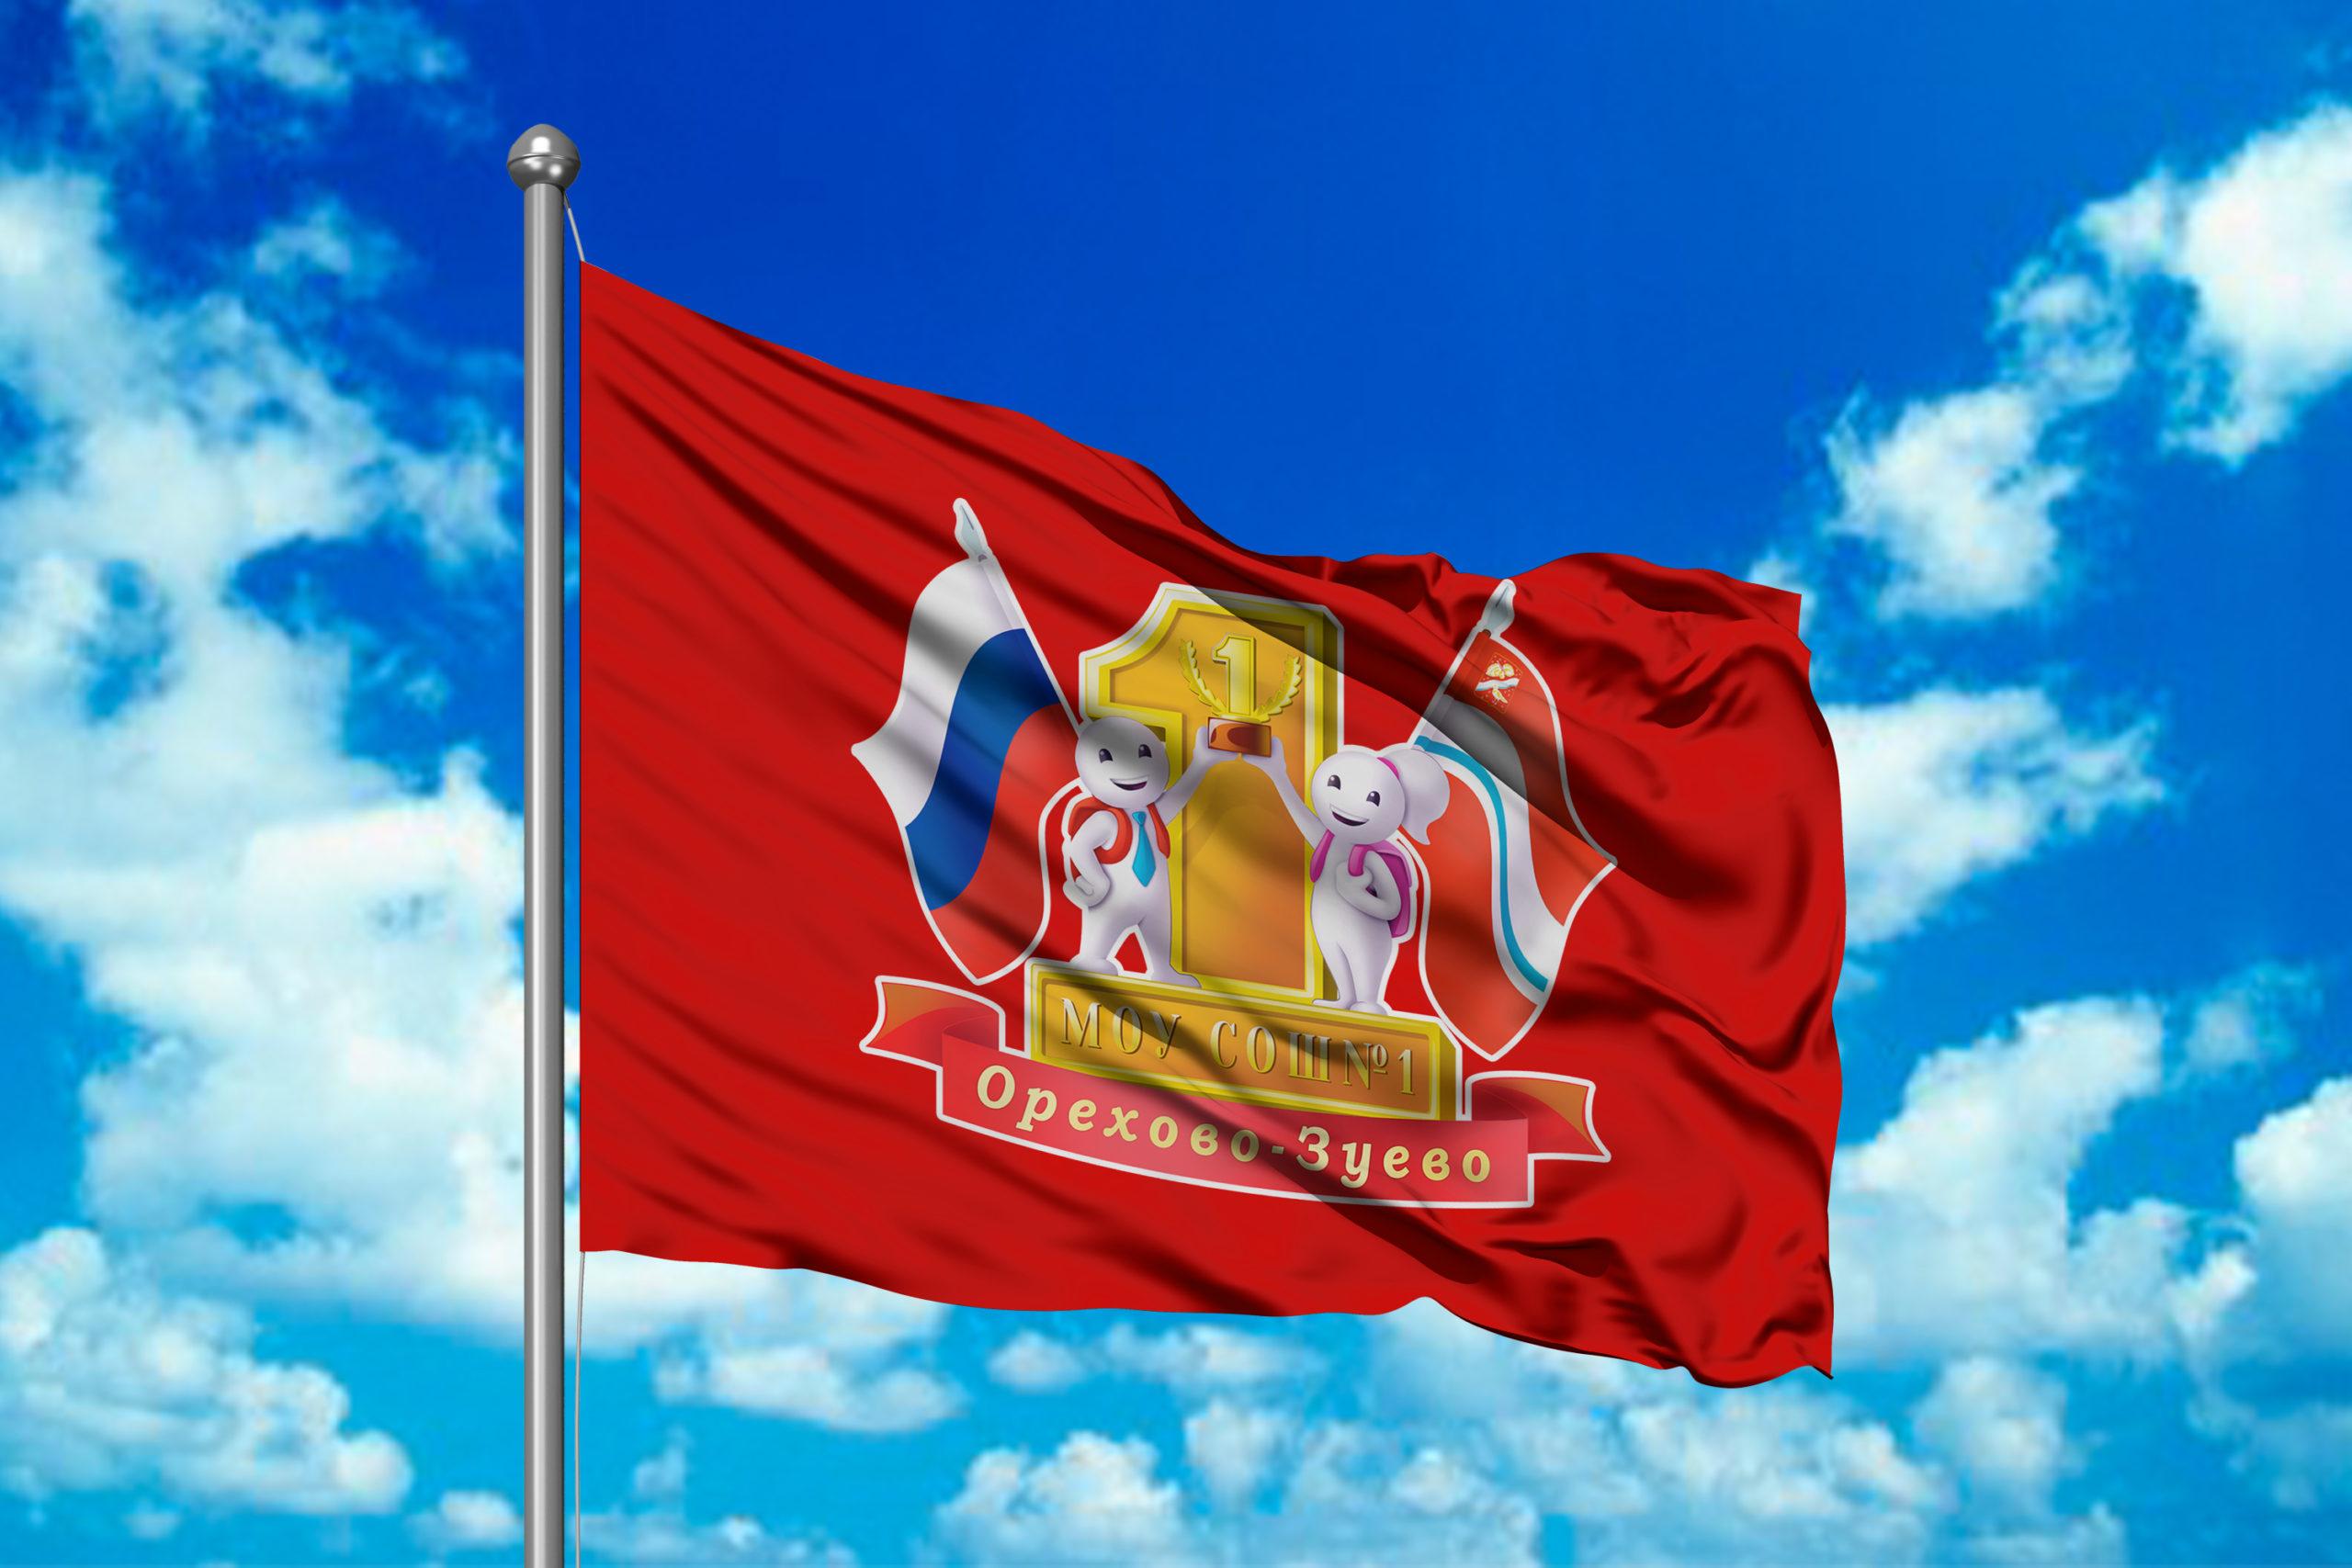 флаг с эмблемой школы